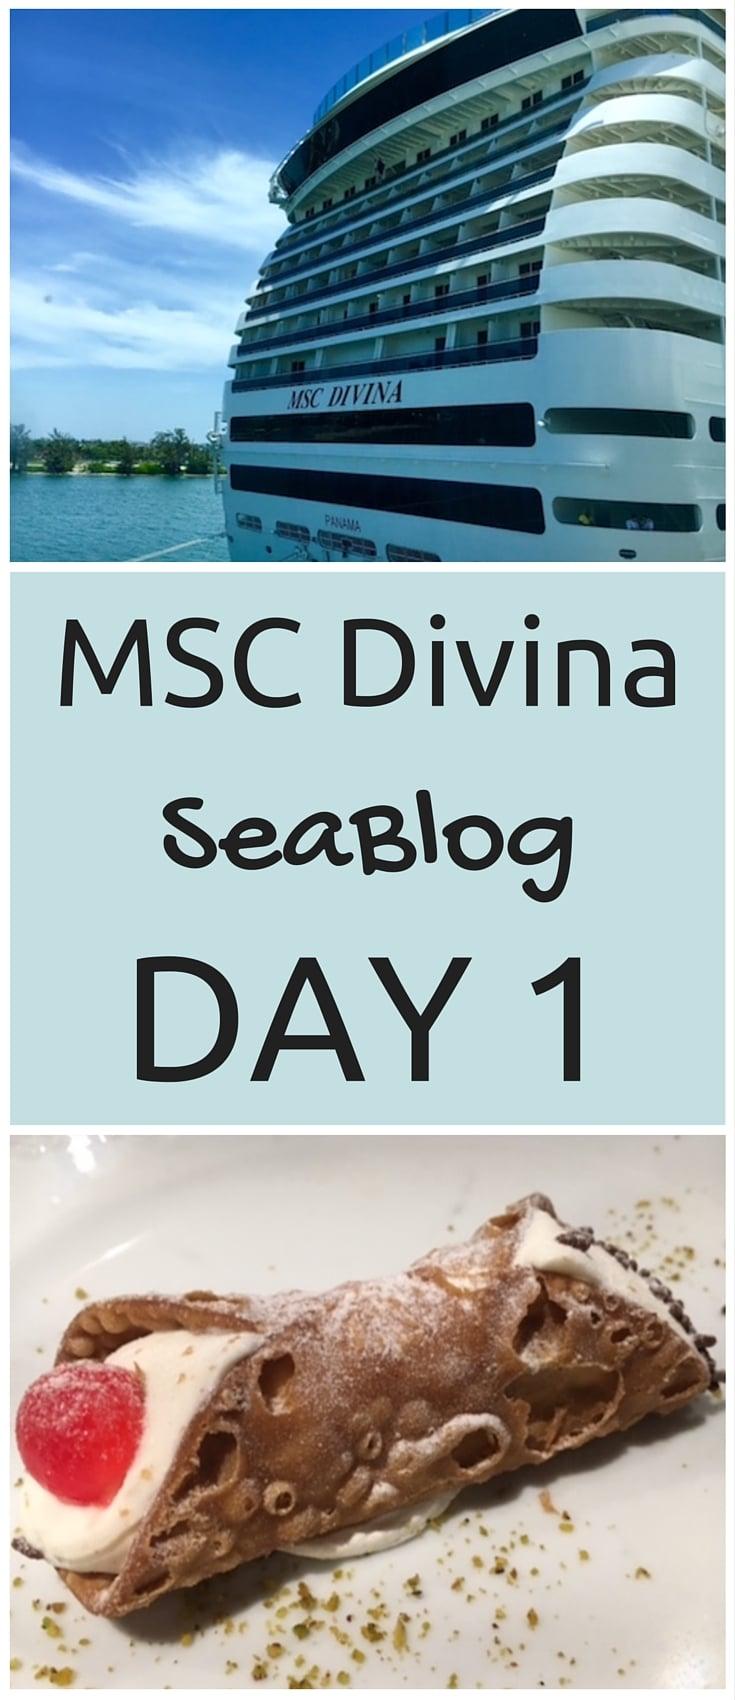 #MSC #divina #cruise #ship